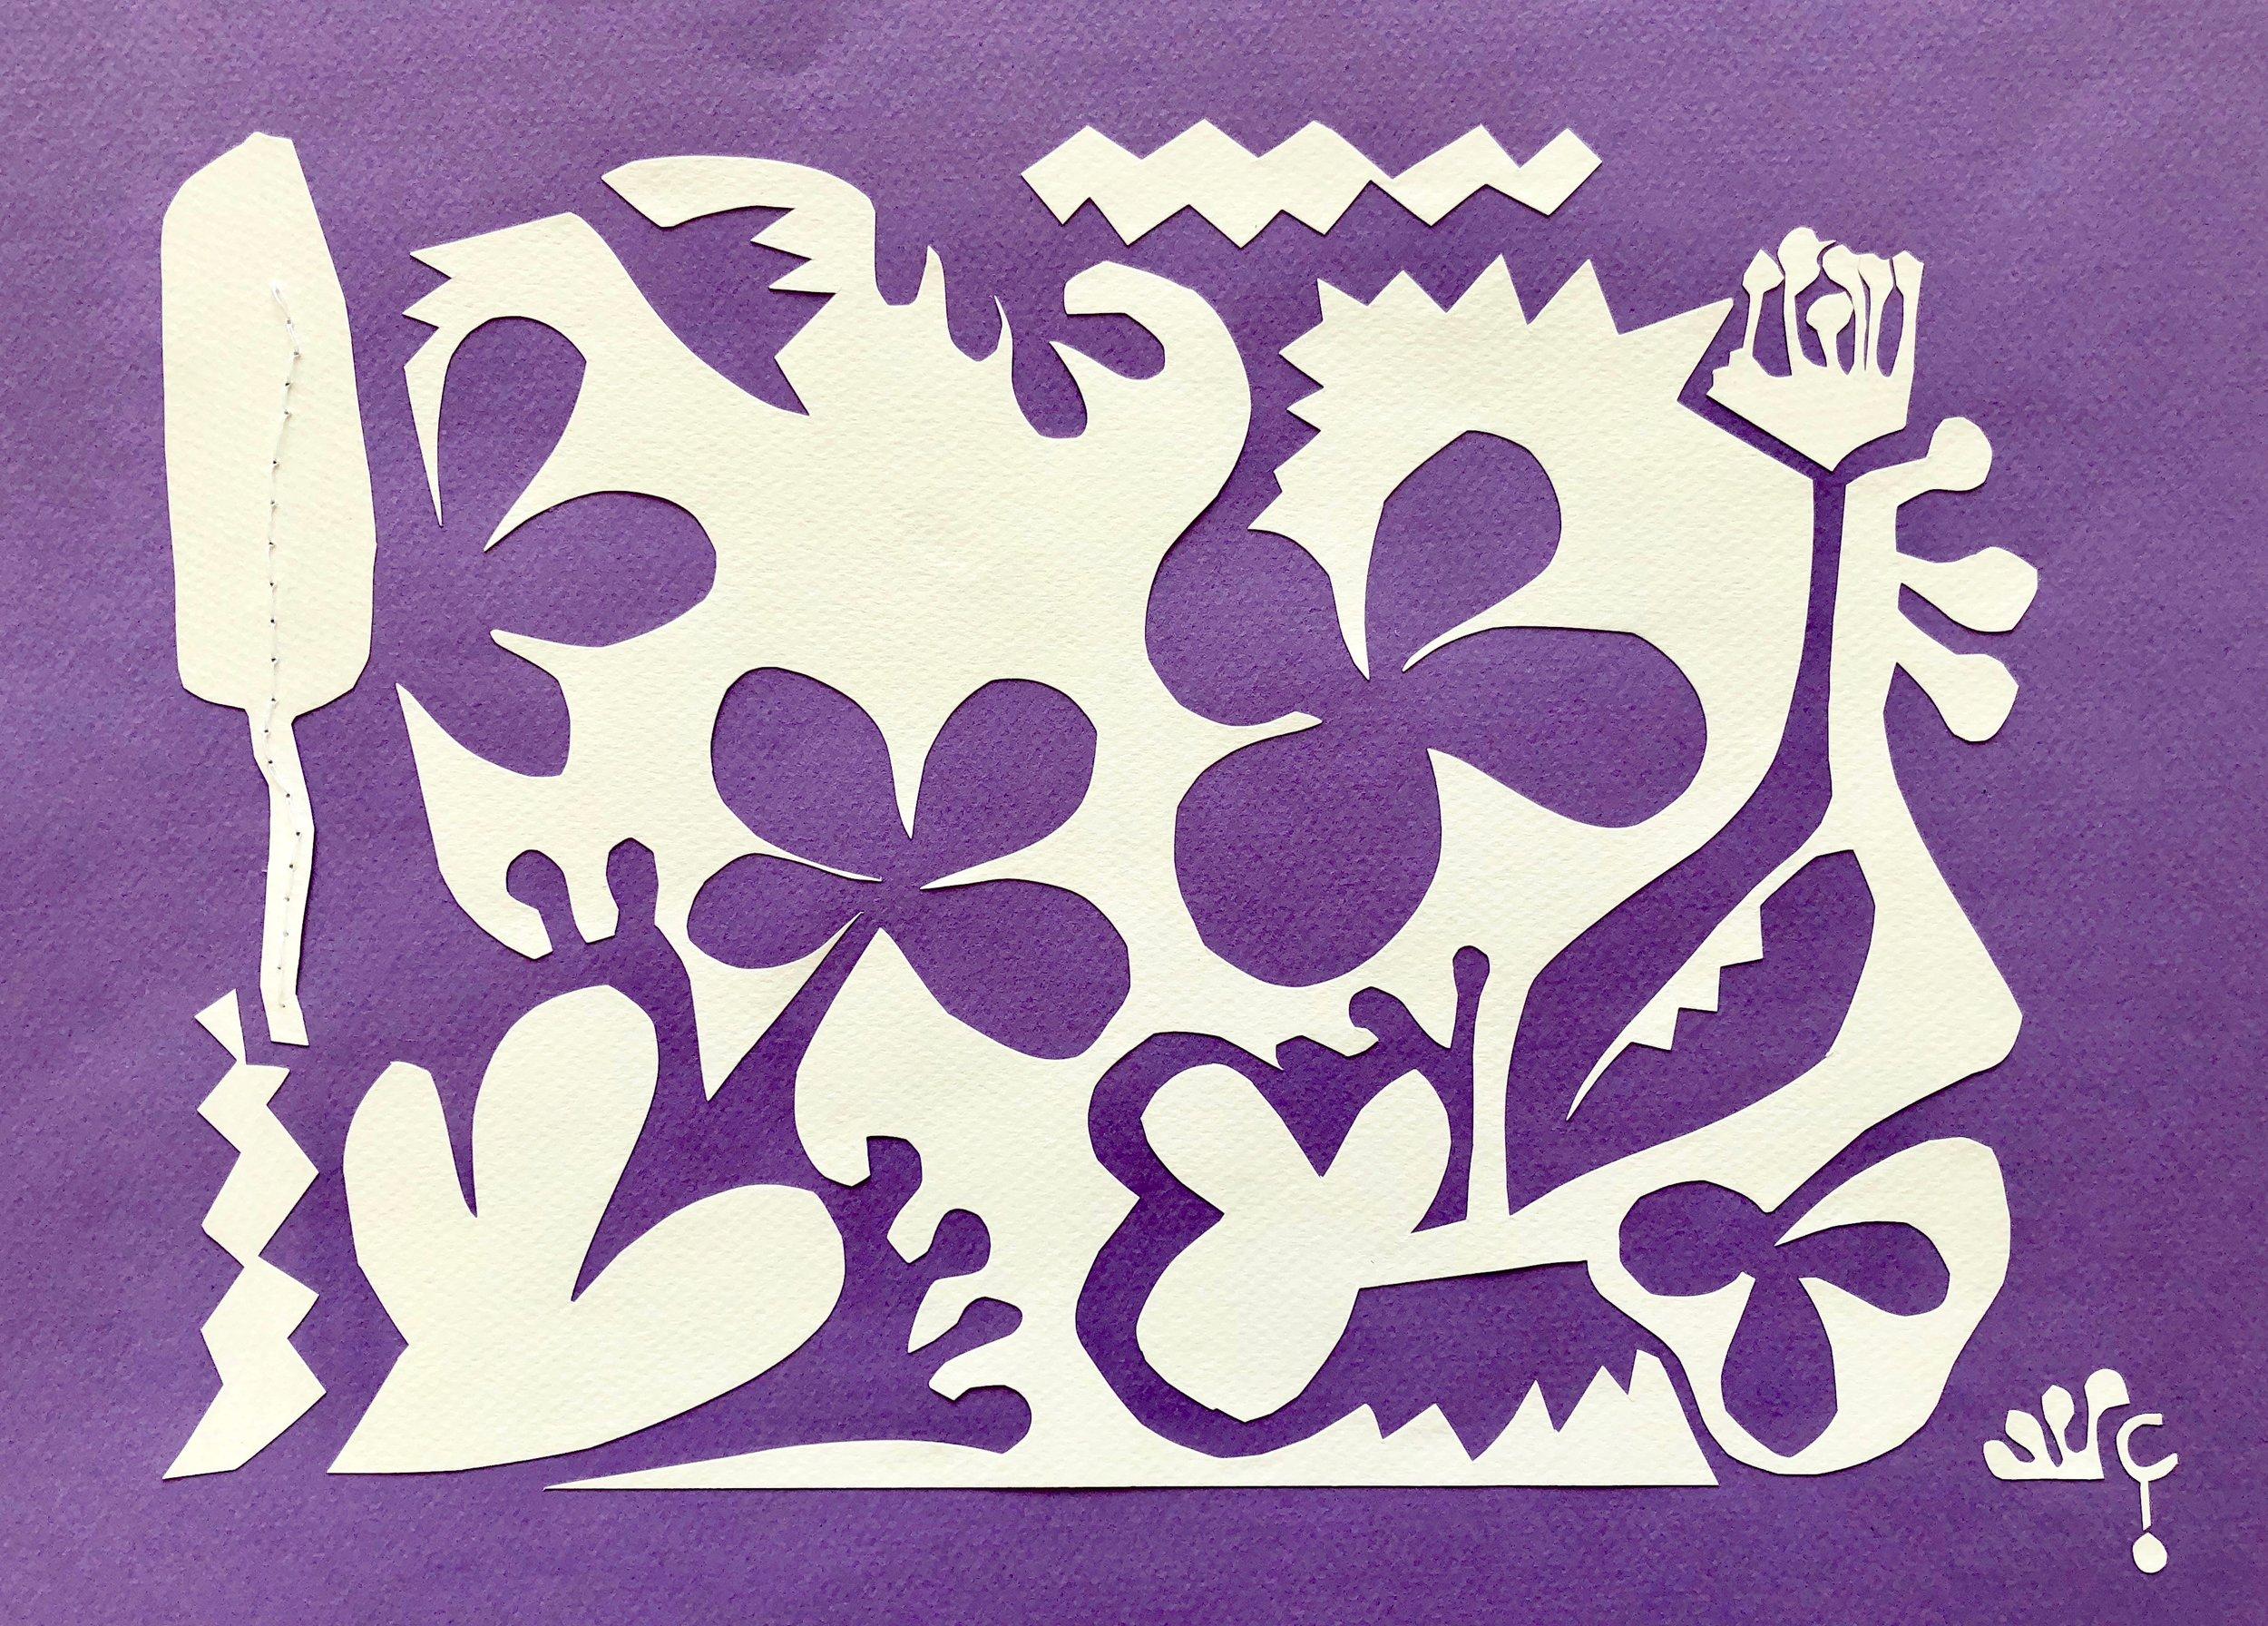 culpepper_purple_paper + cotton thread collage_10x14.jpg